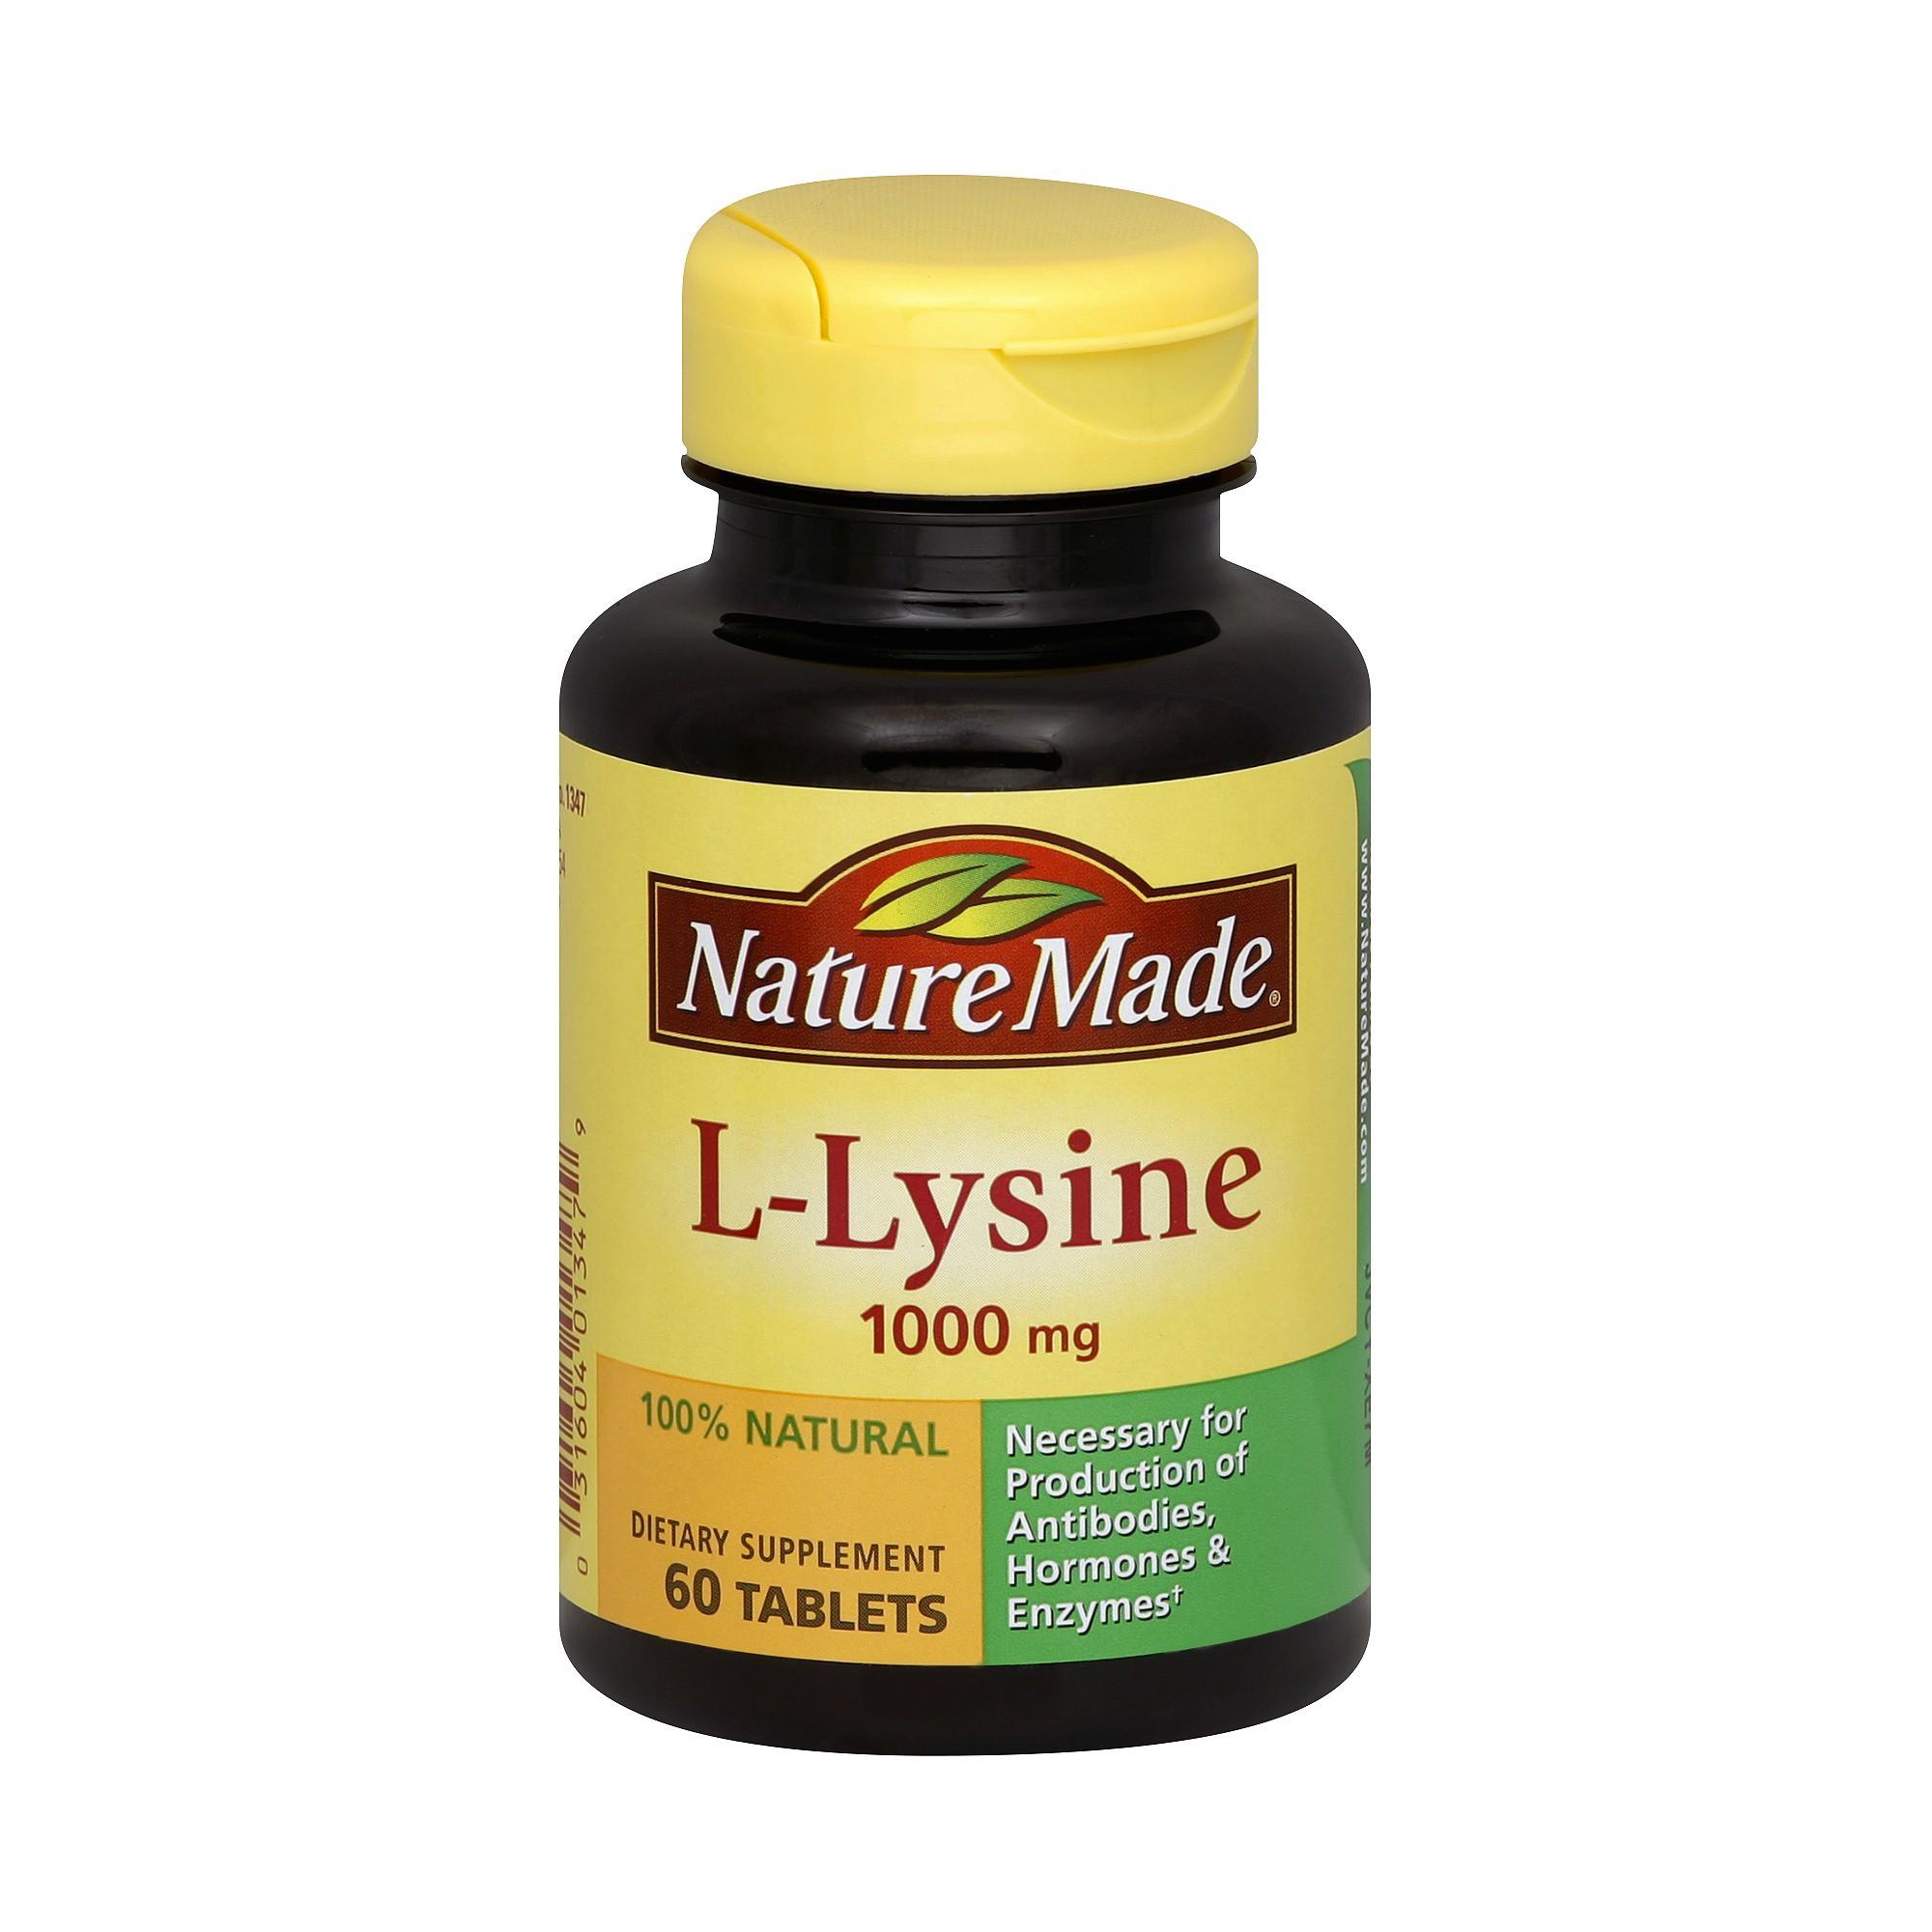 Nature Made L-Lysine Dietary SupplementTablets